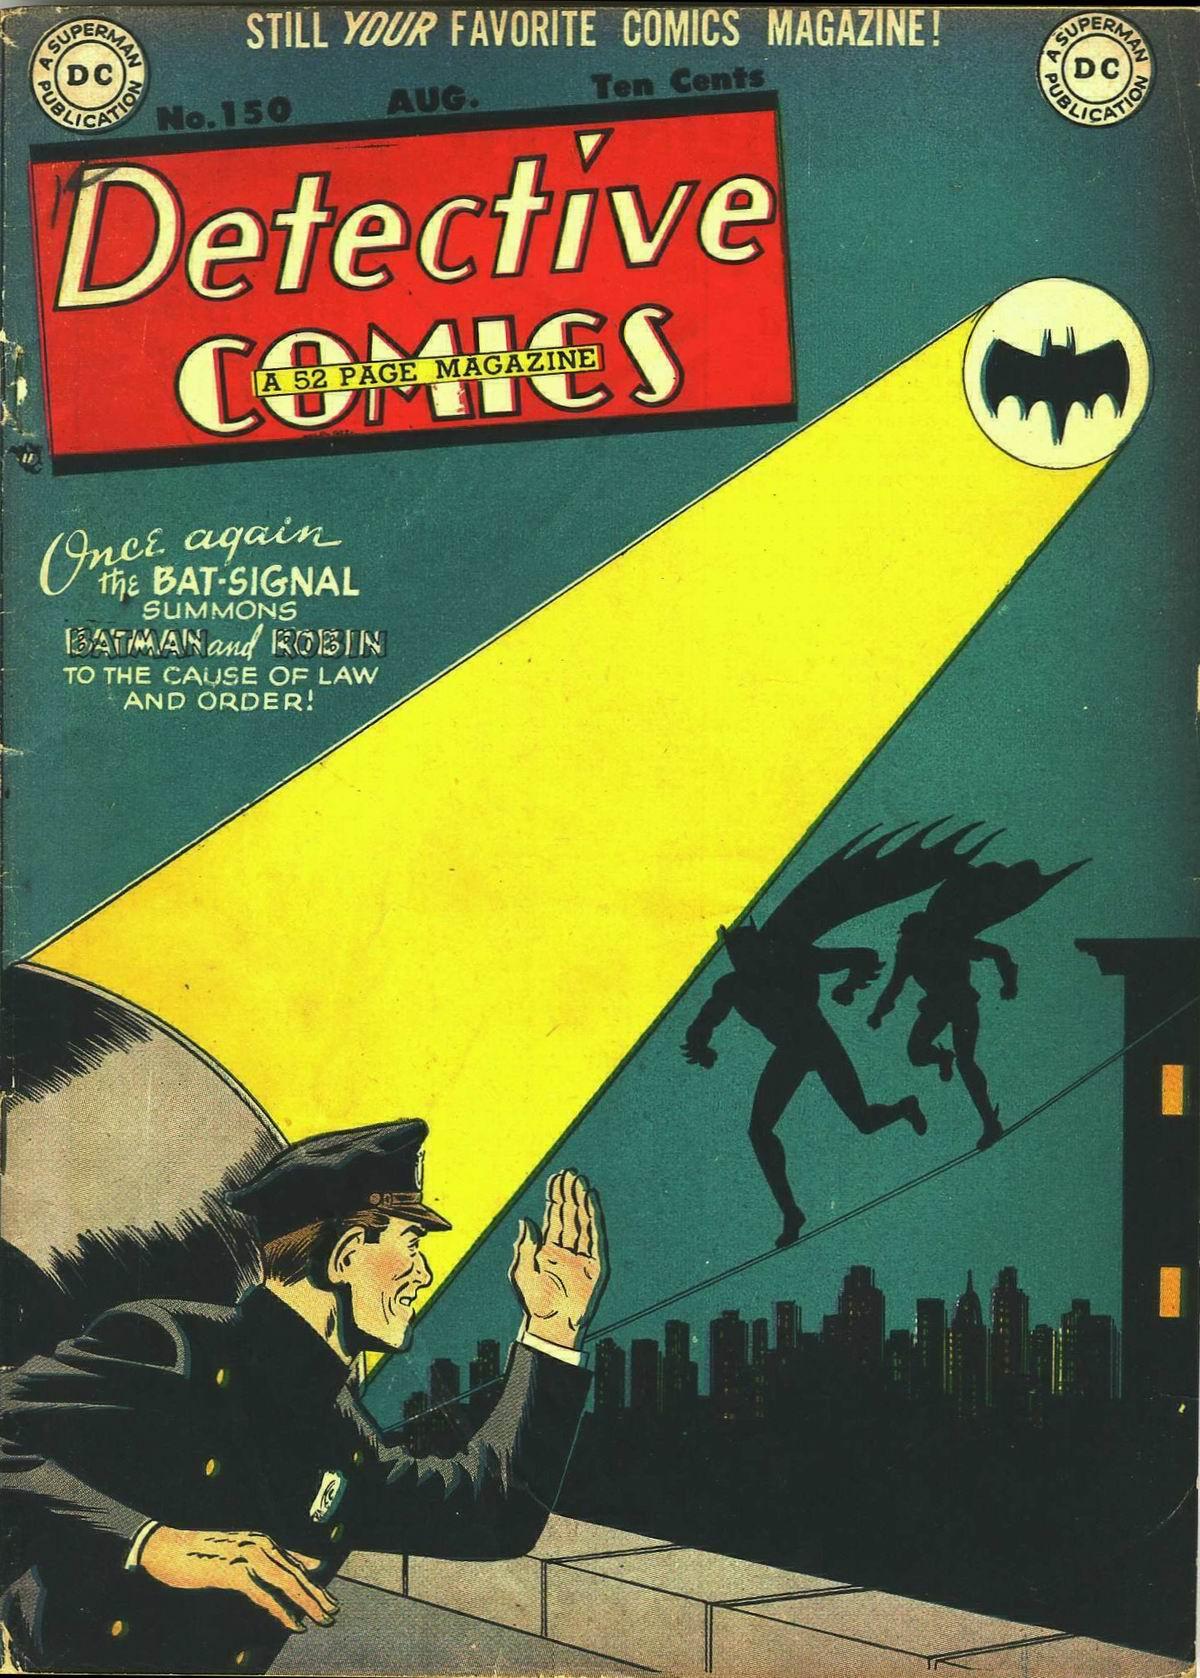 Read online Detective Comics (1937) comic -  Issue #150 - 1